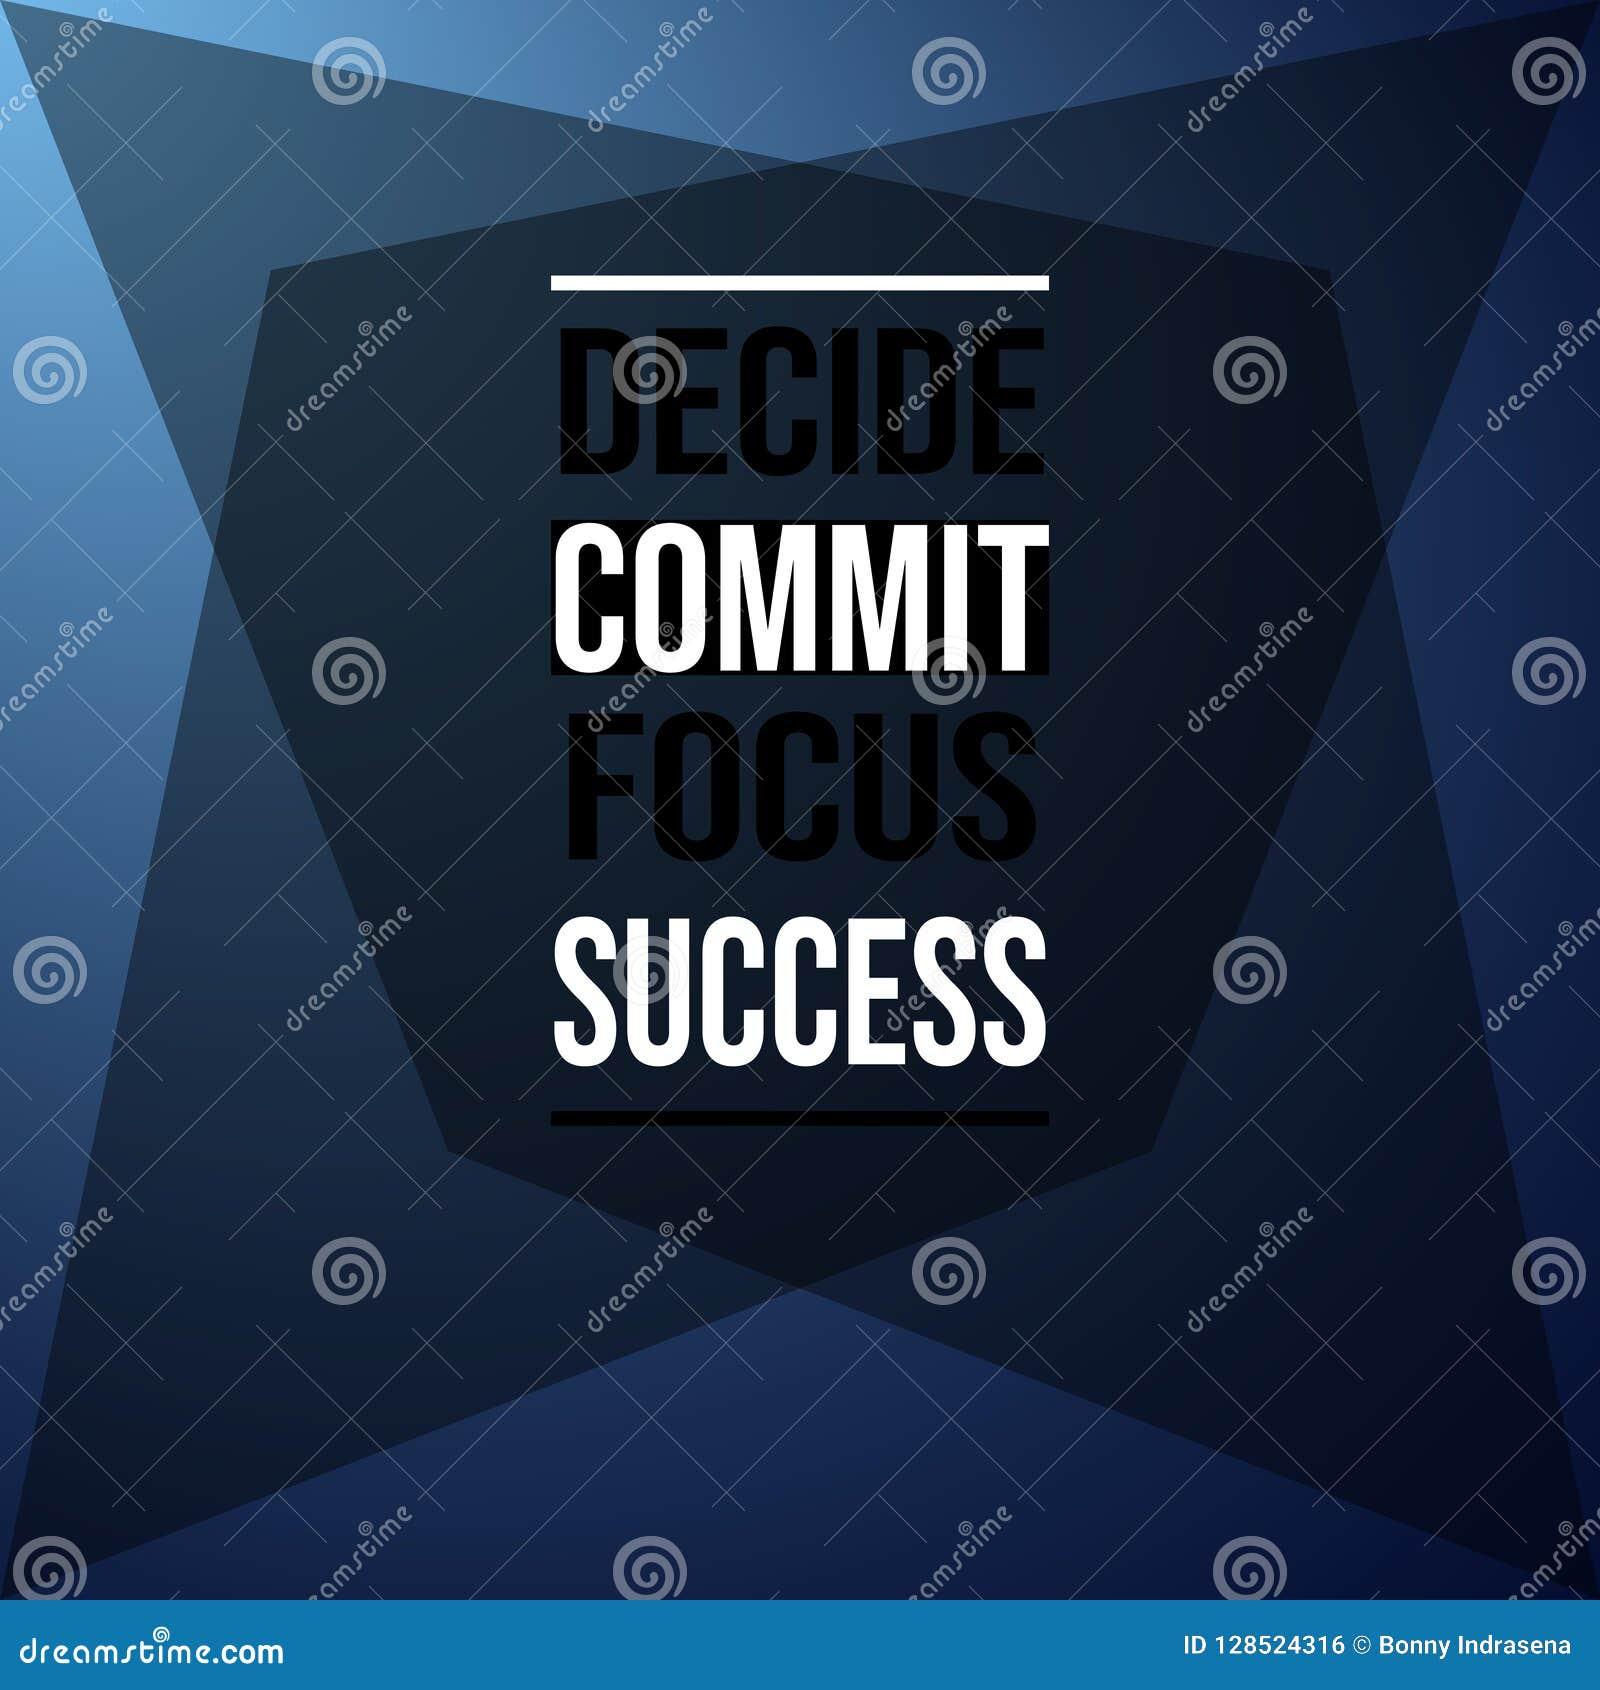 Decide commit focus success. Inspiration and motivation quote